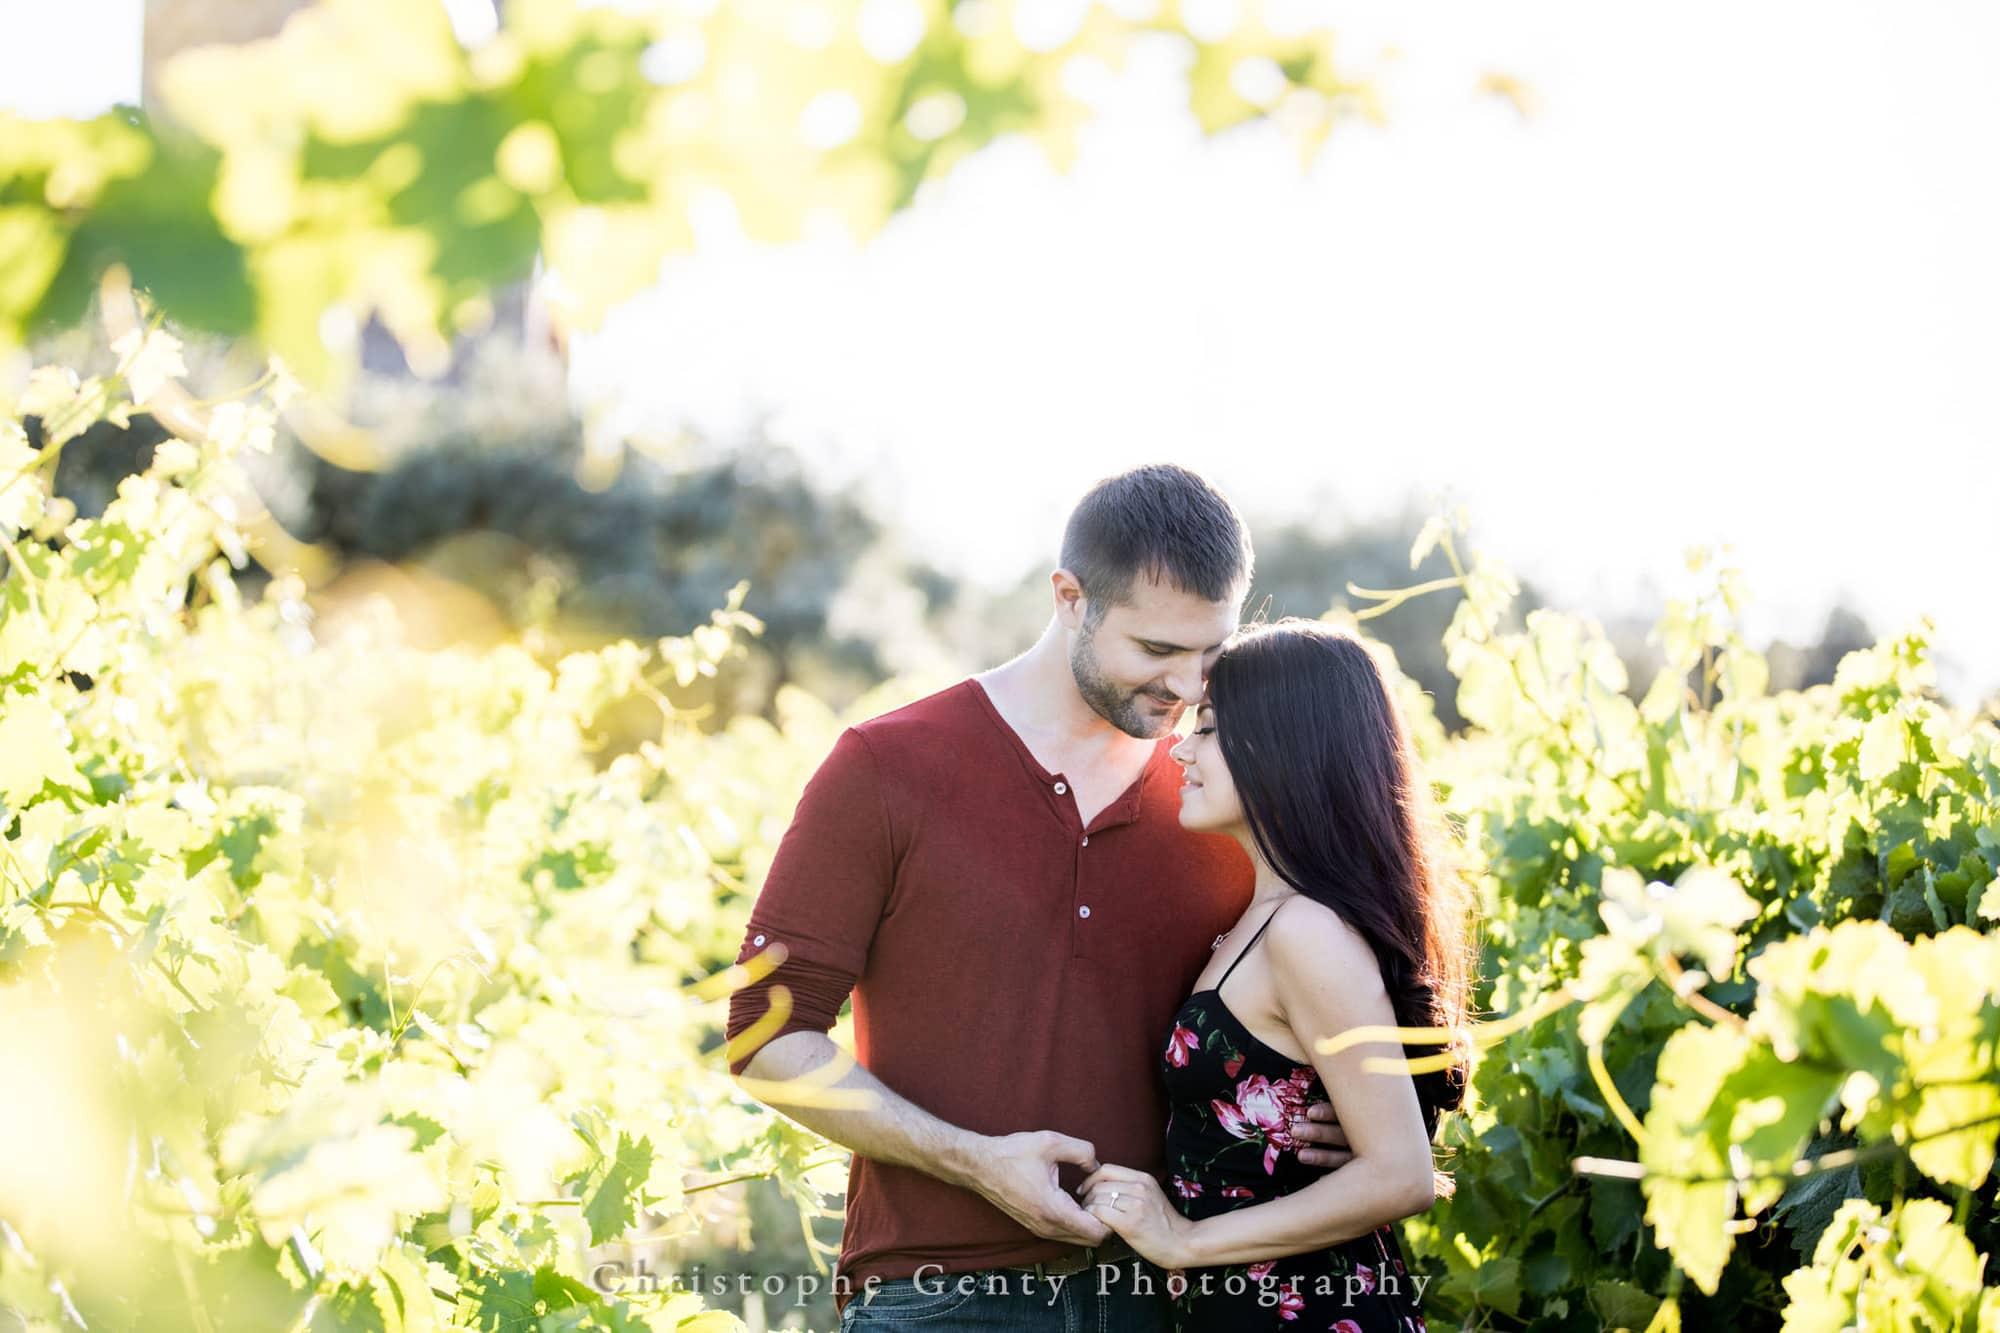 Castello di Amorosa Marriage Proposal Photography 373